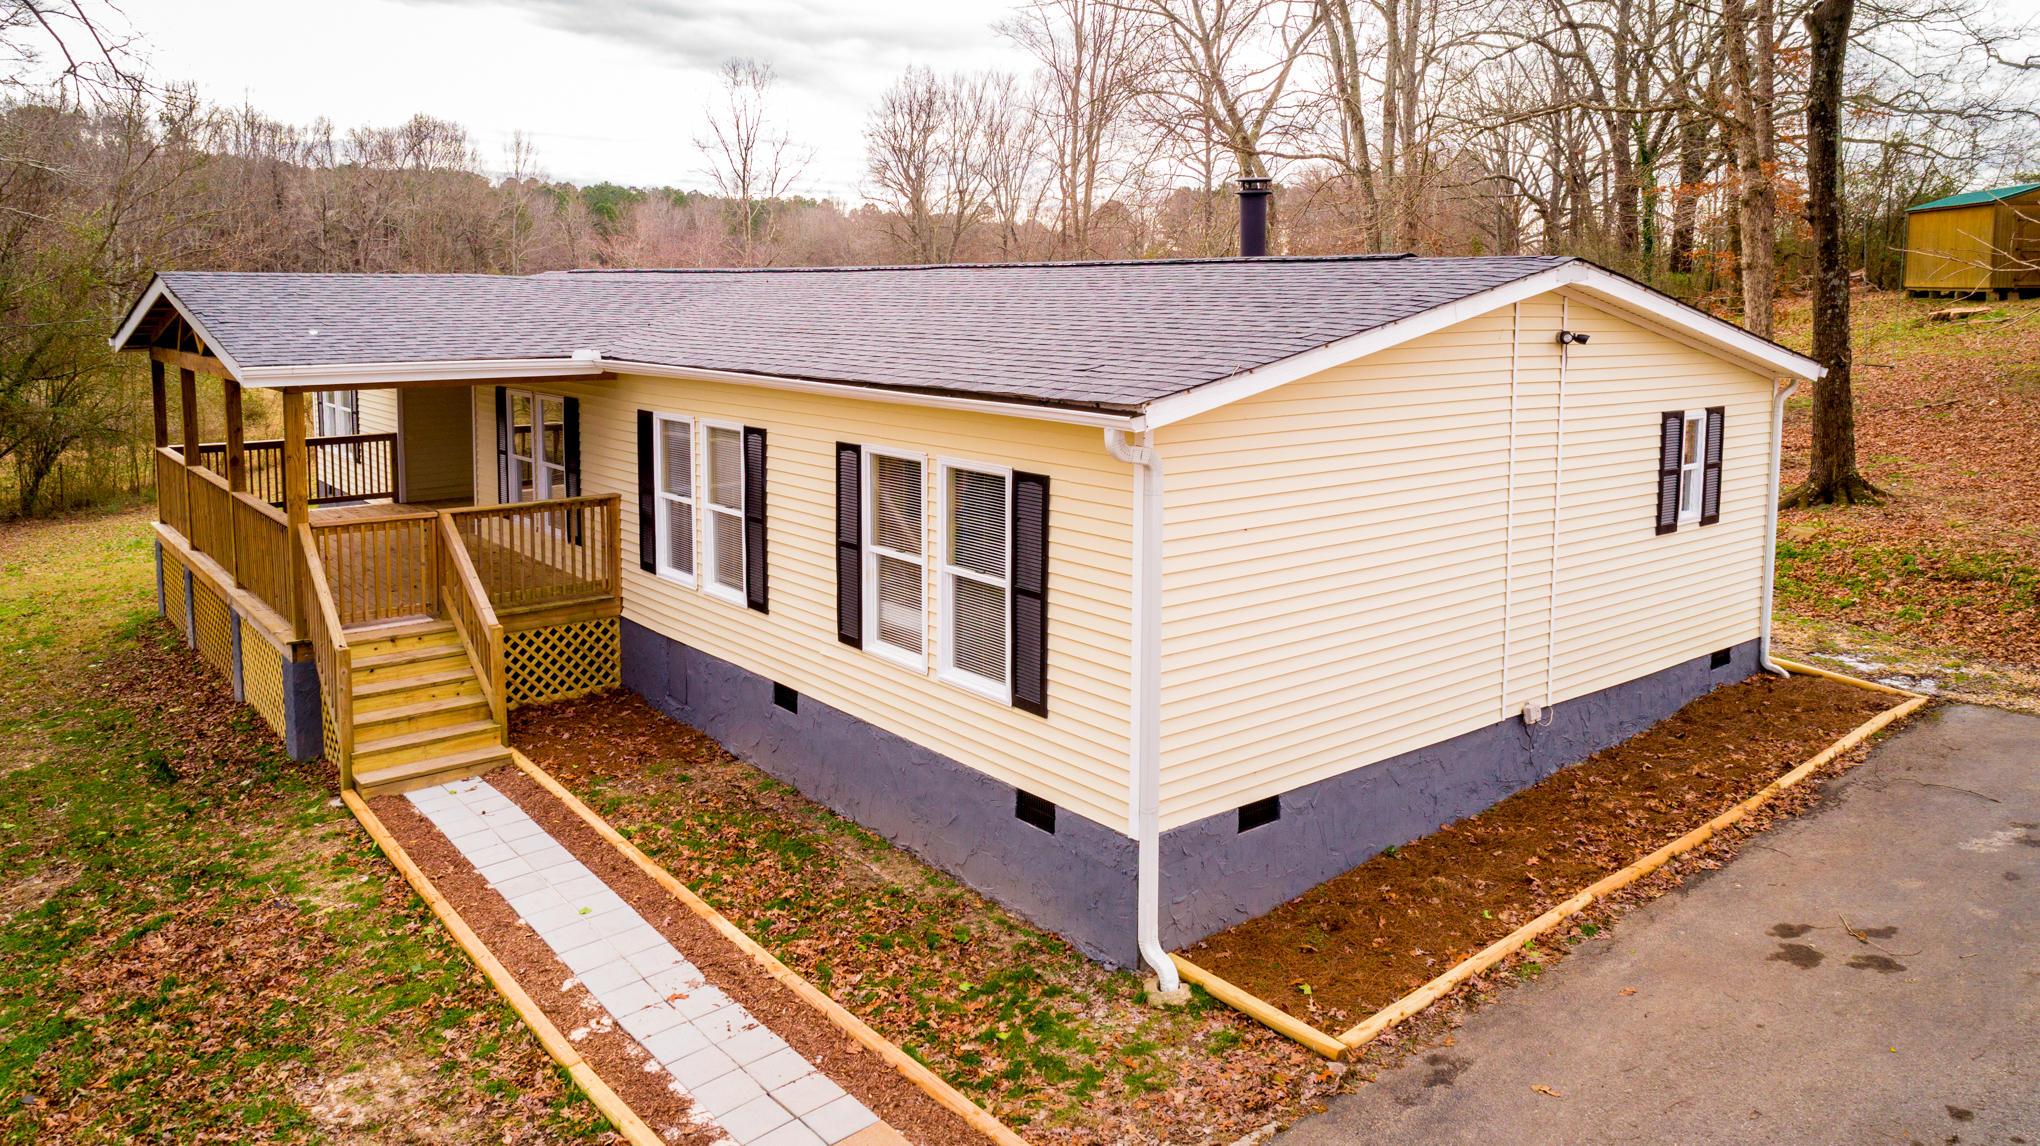 520 Wood Station Rd, Rock Spring, GA 30739